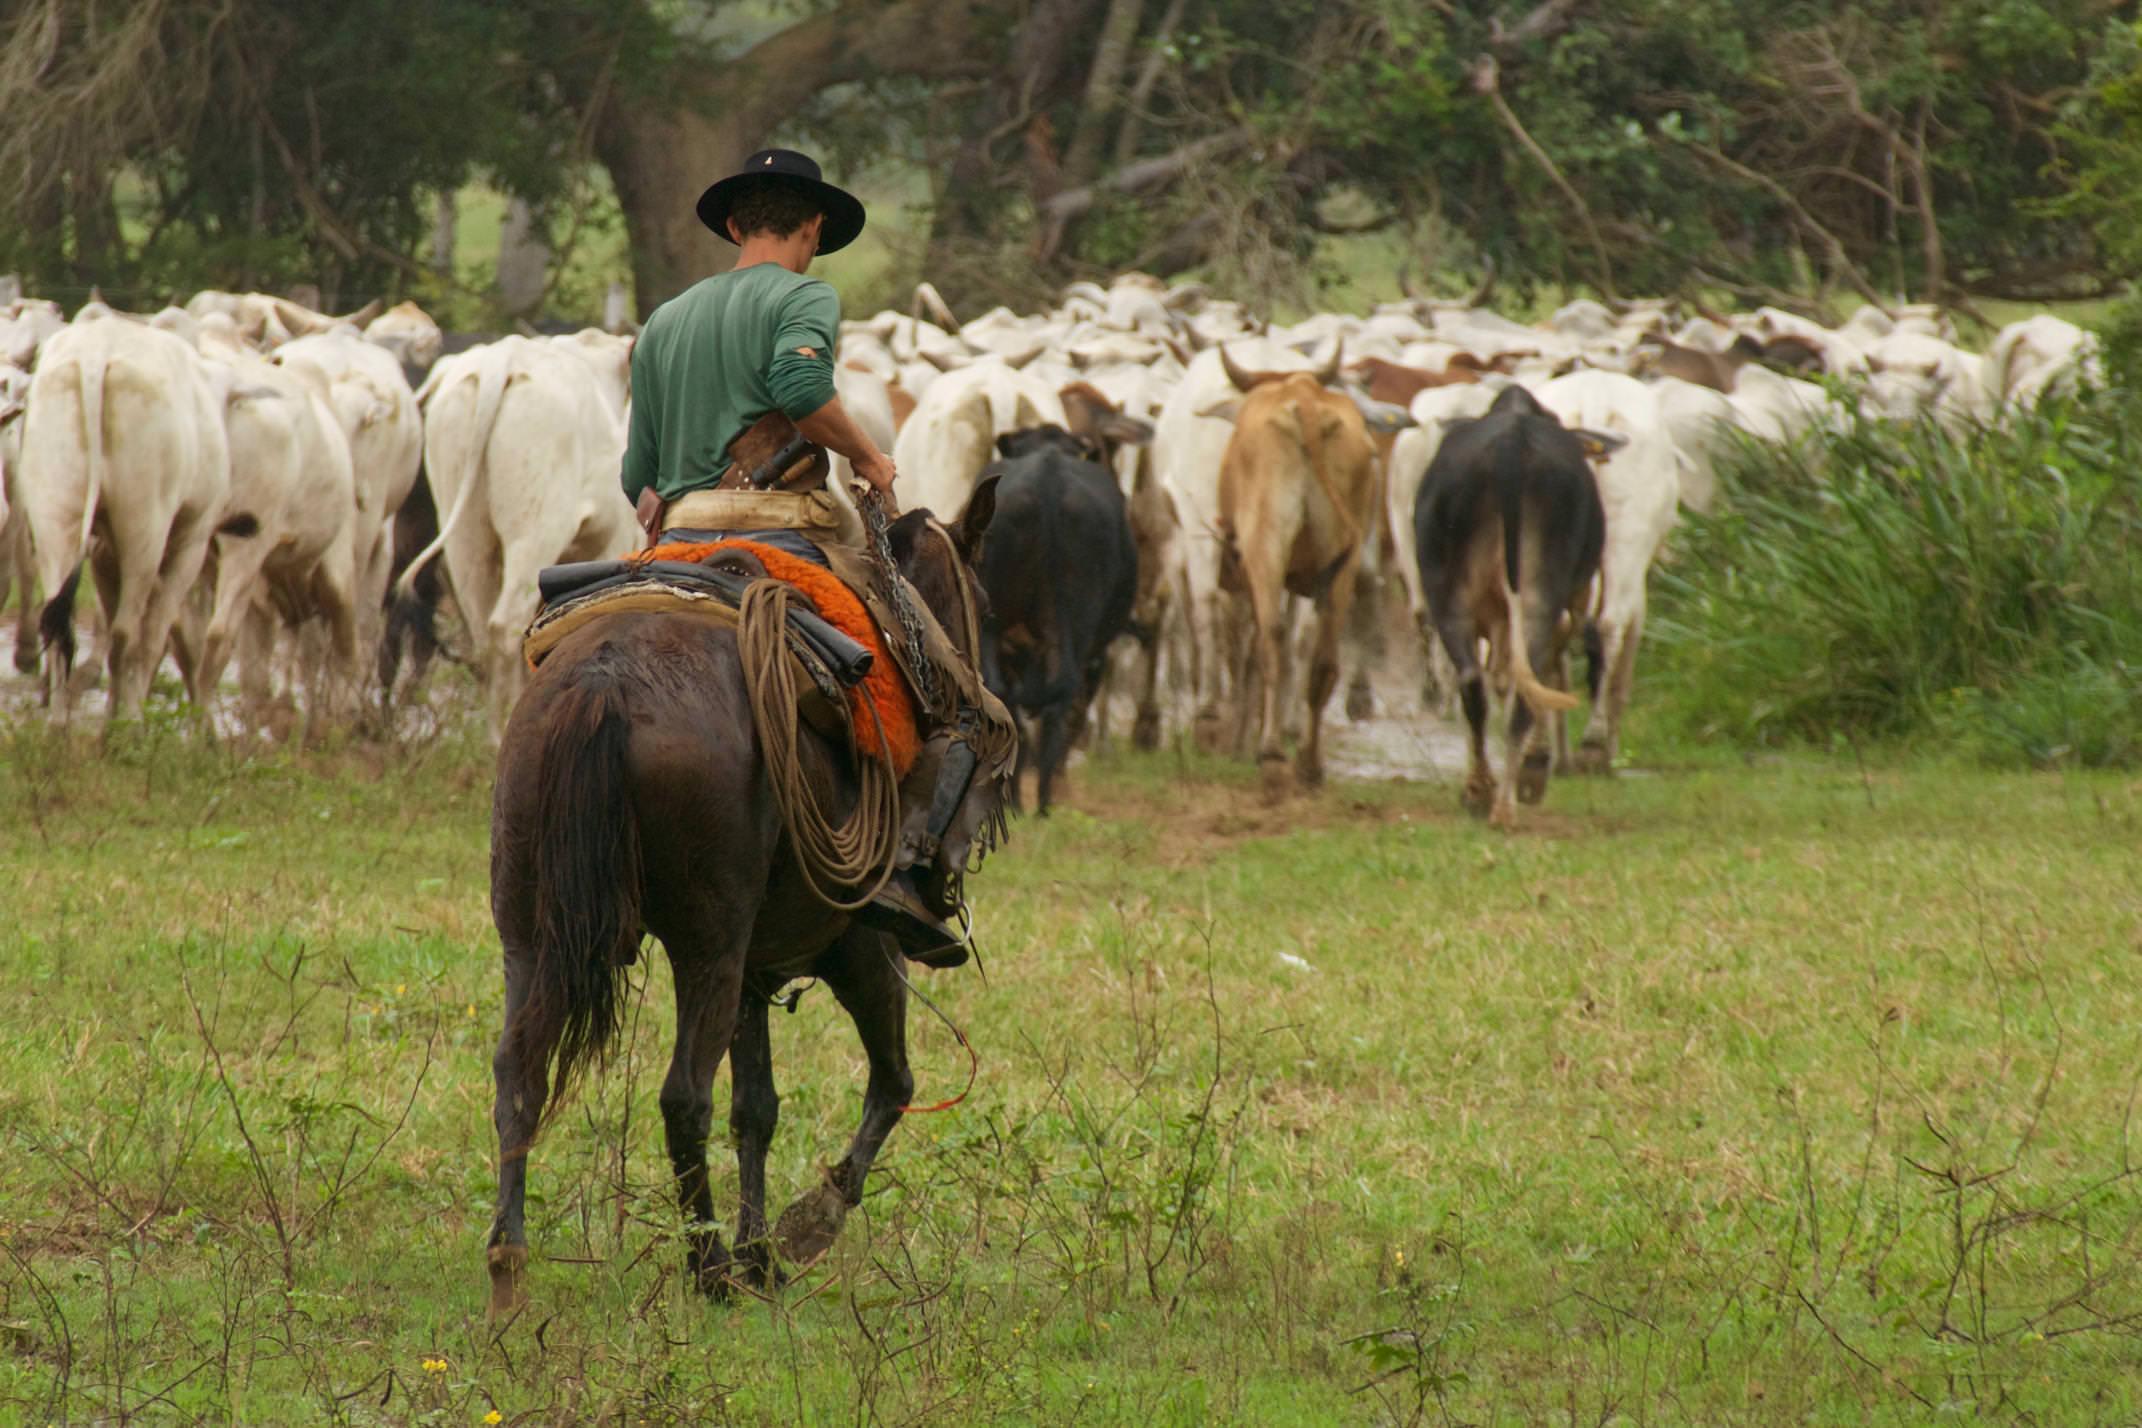 Brazil pantanal caiman lodge herding cattle copyright thomas power pura aventura jpg